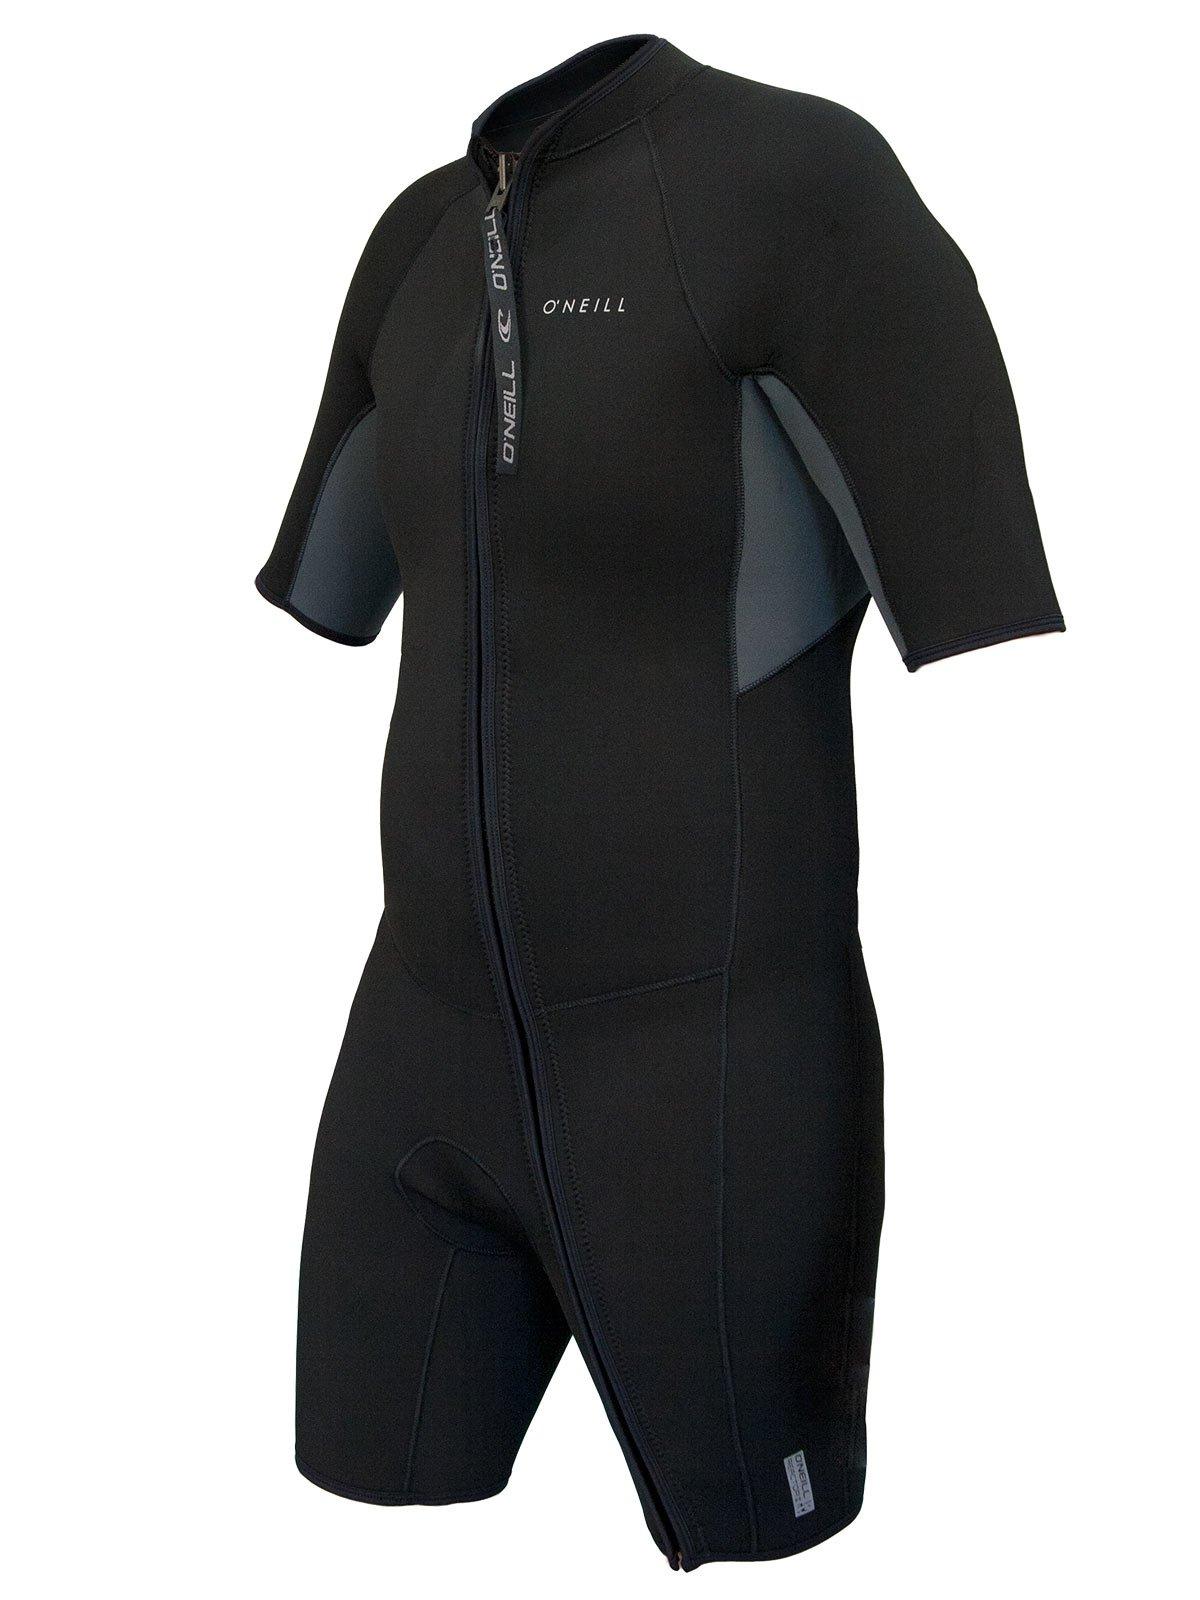 O'Neill Reactor-2 Men's Front Zip Spring Medium Tall Black/Graphite (5064IS)